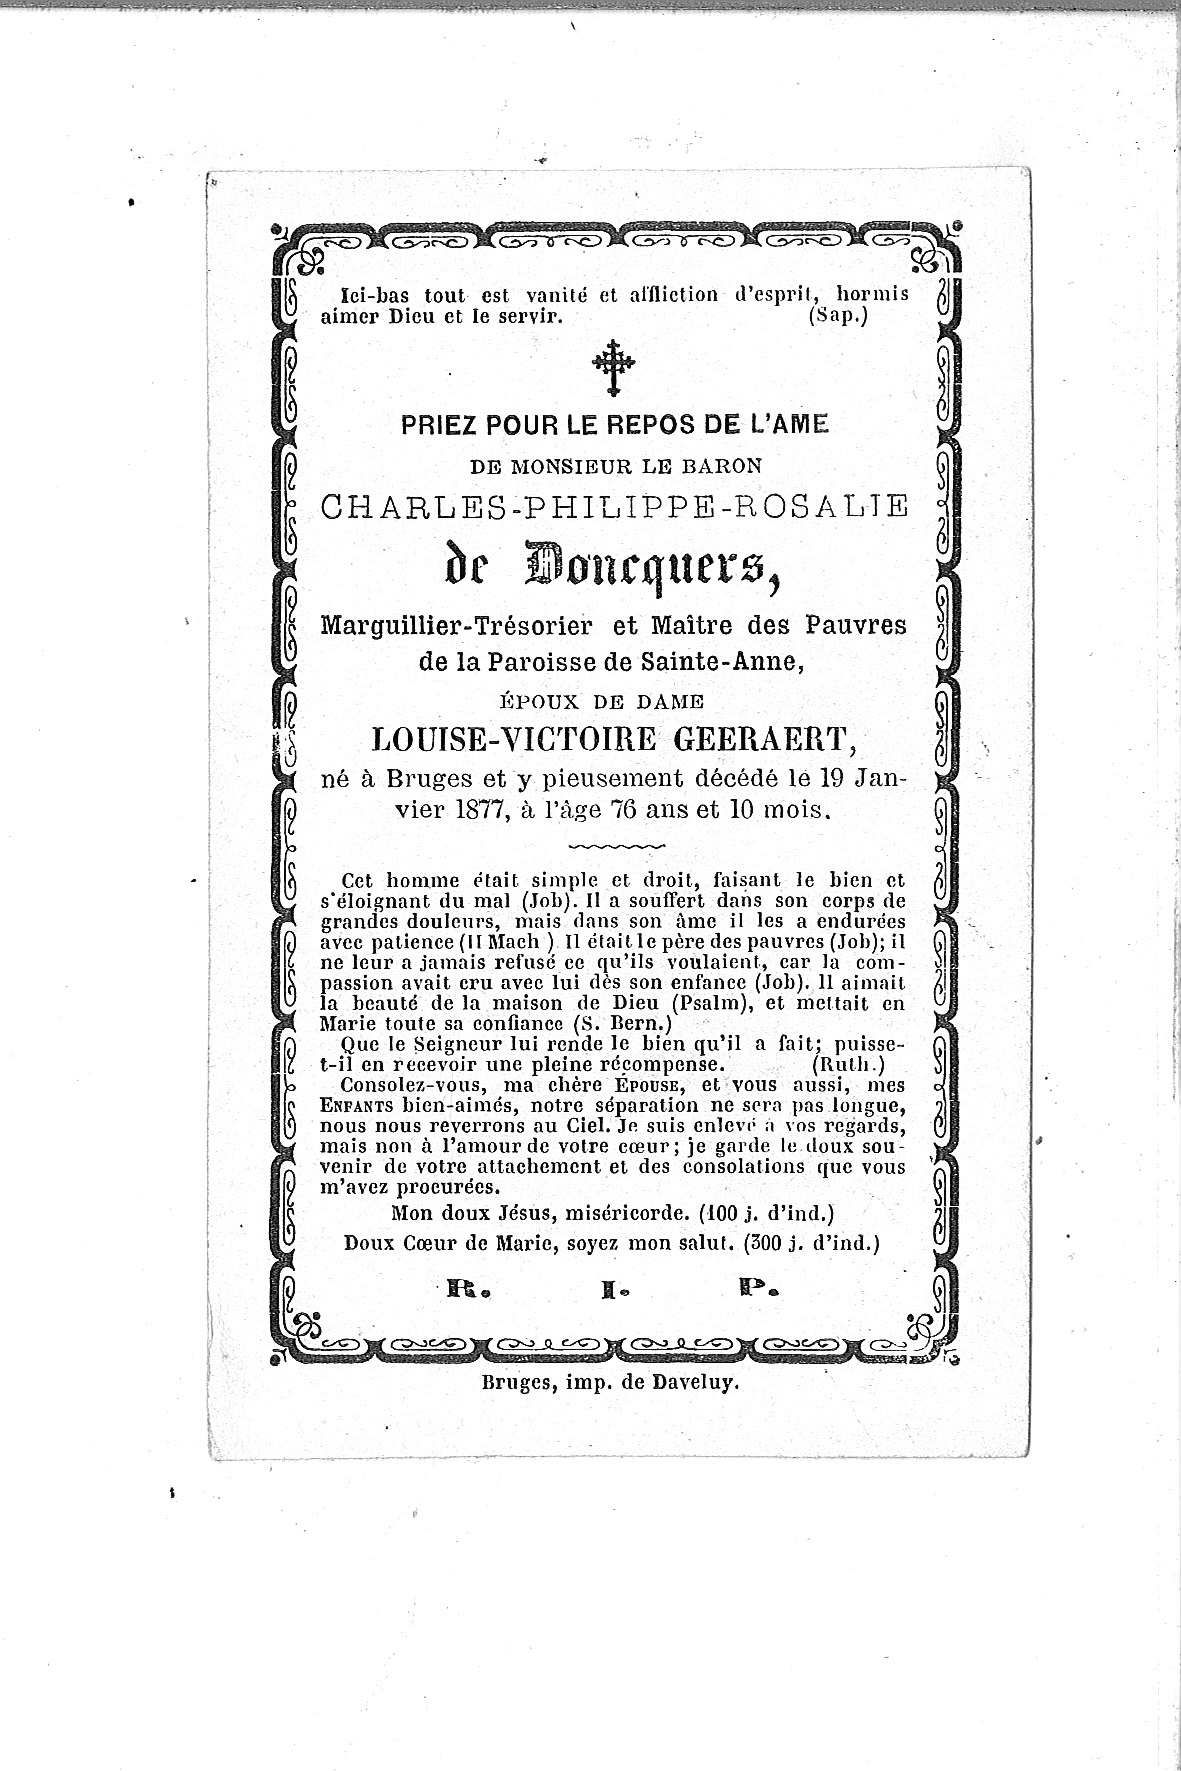 Charles-Philippe-Rosalie-(1877)-20120817110443_00037.jpg